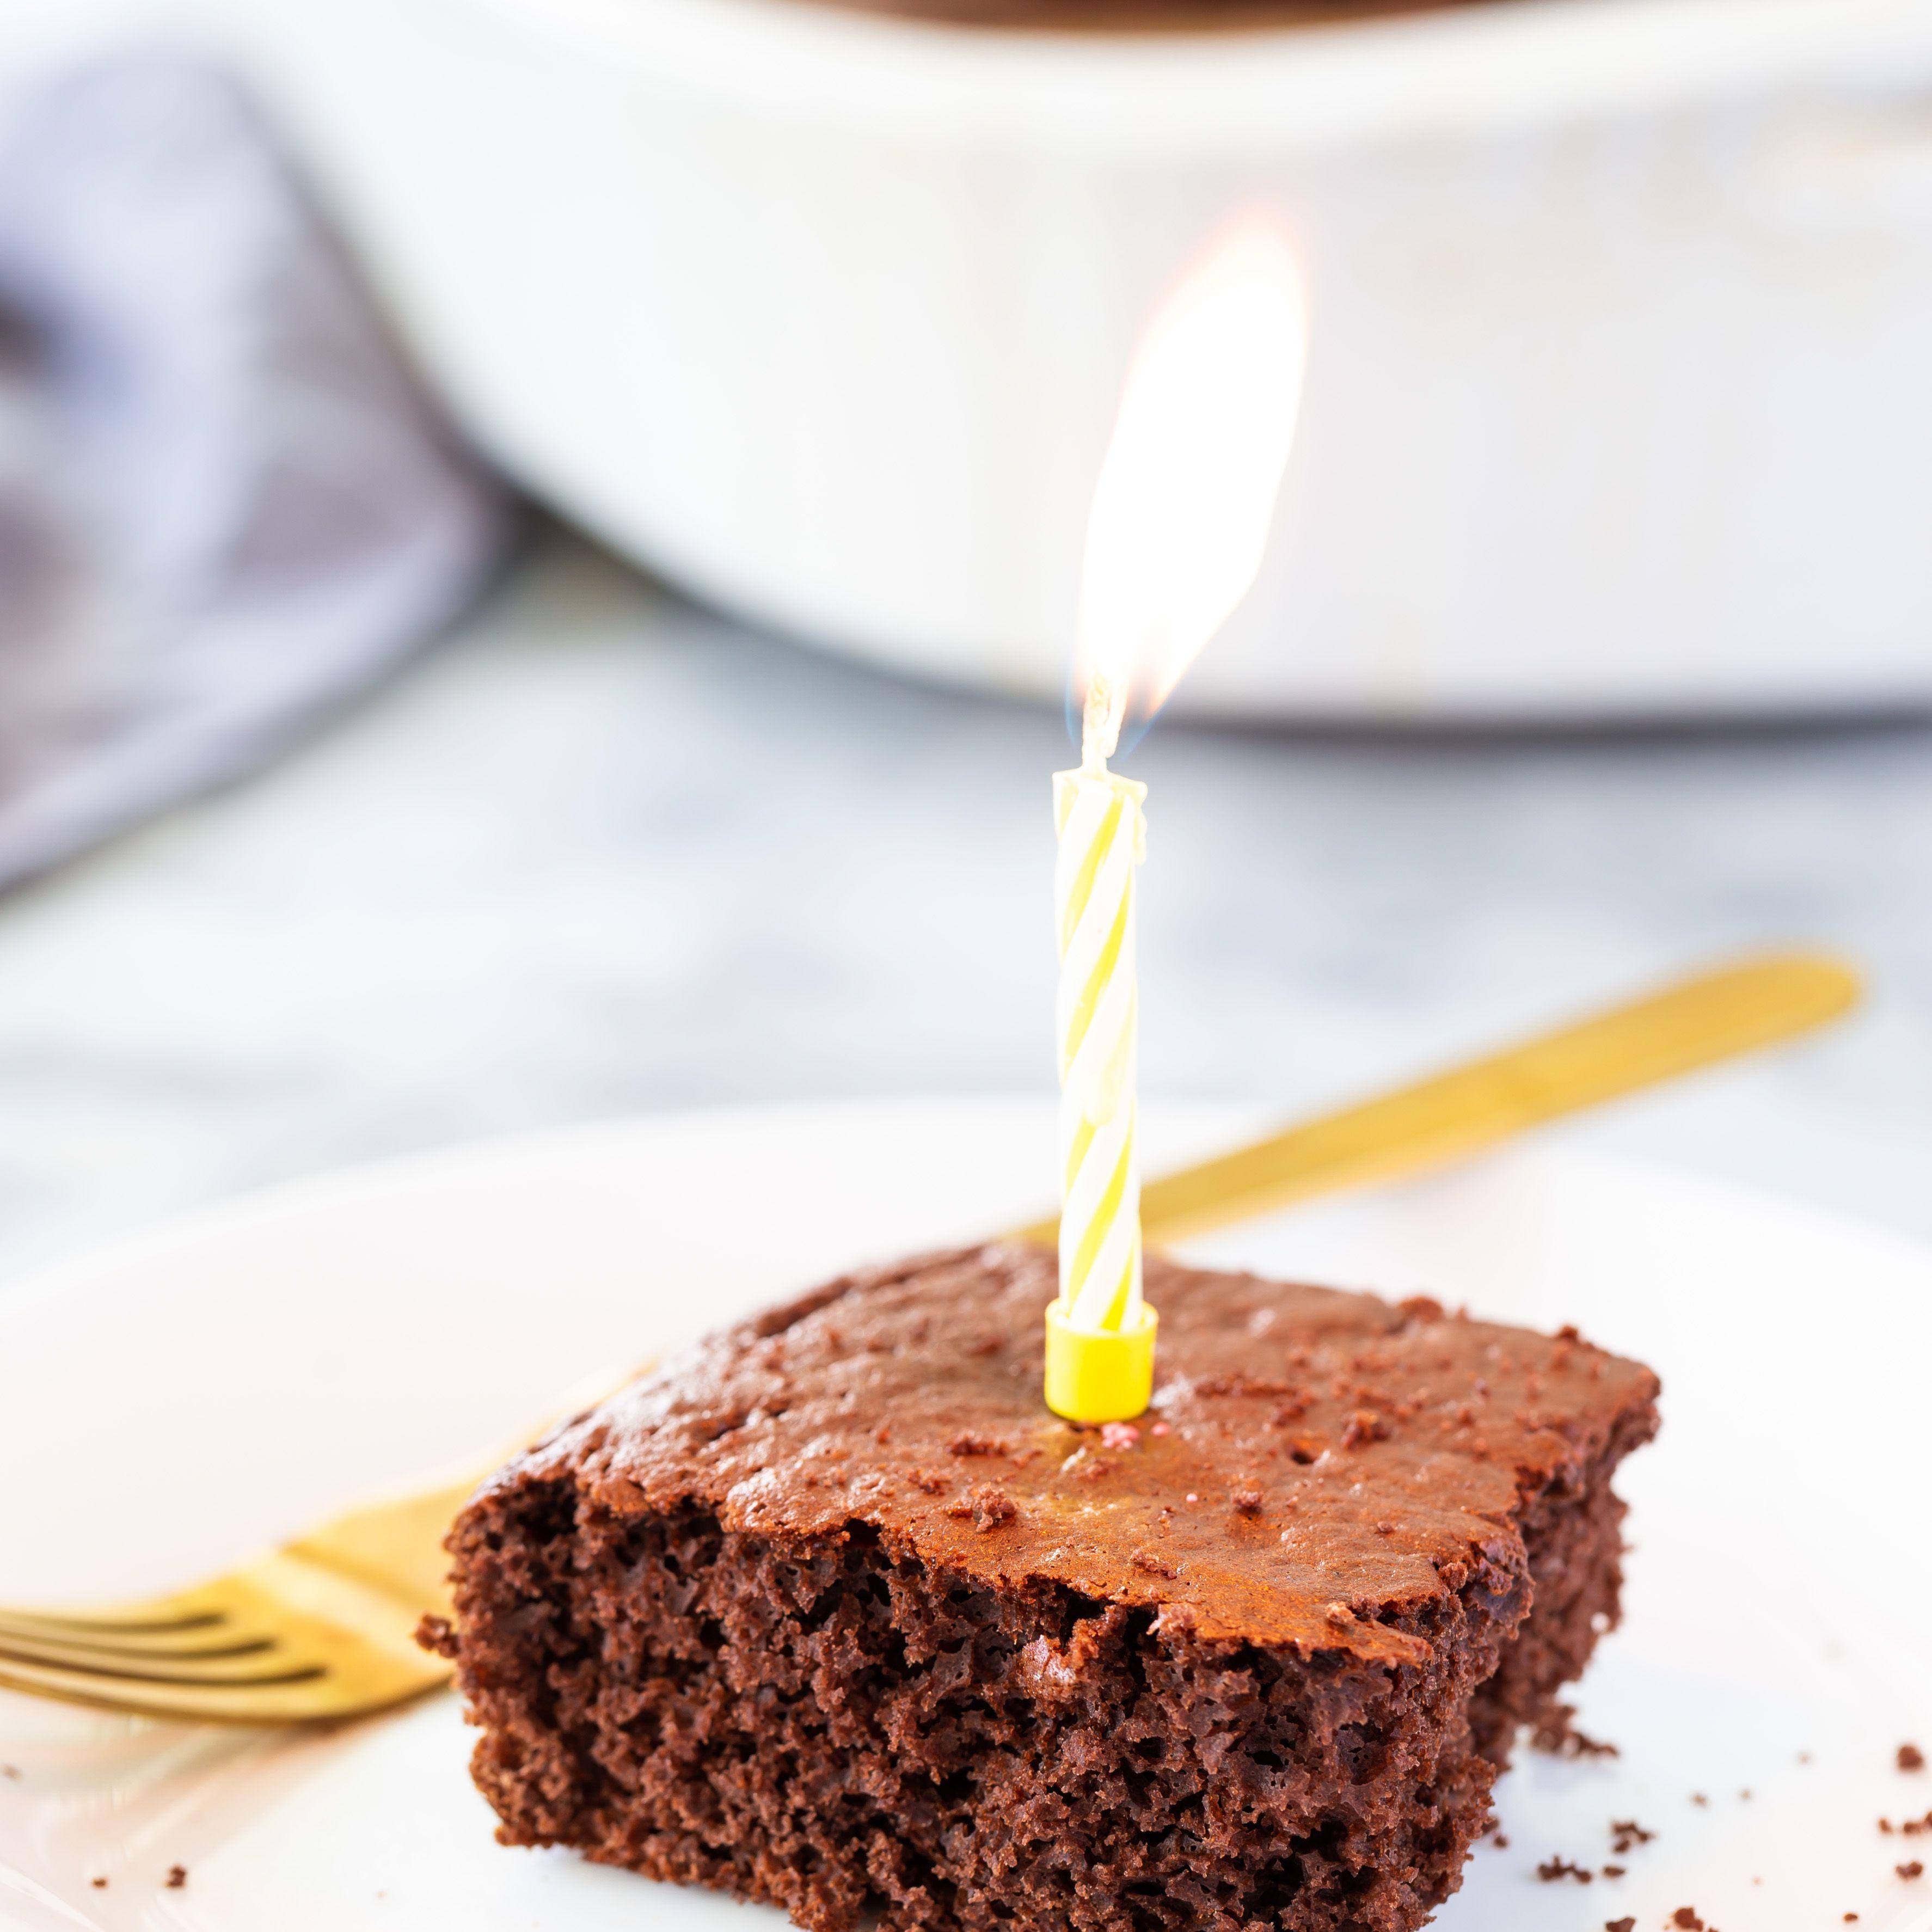 Cake Recipe Using Coconut Soda And Coconut Milk